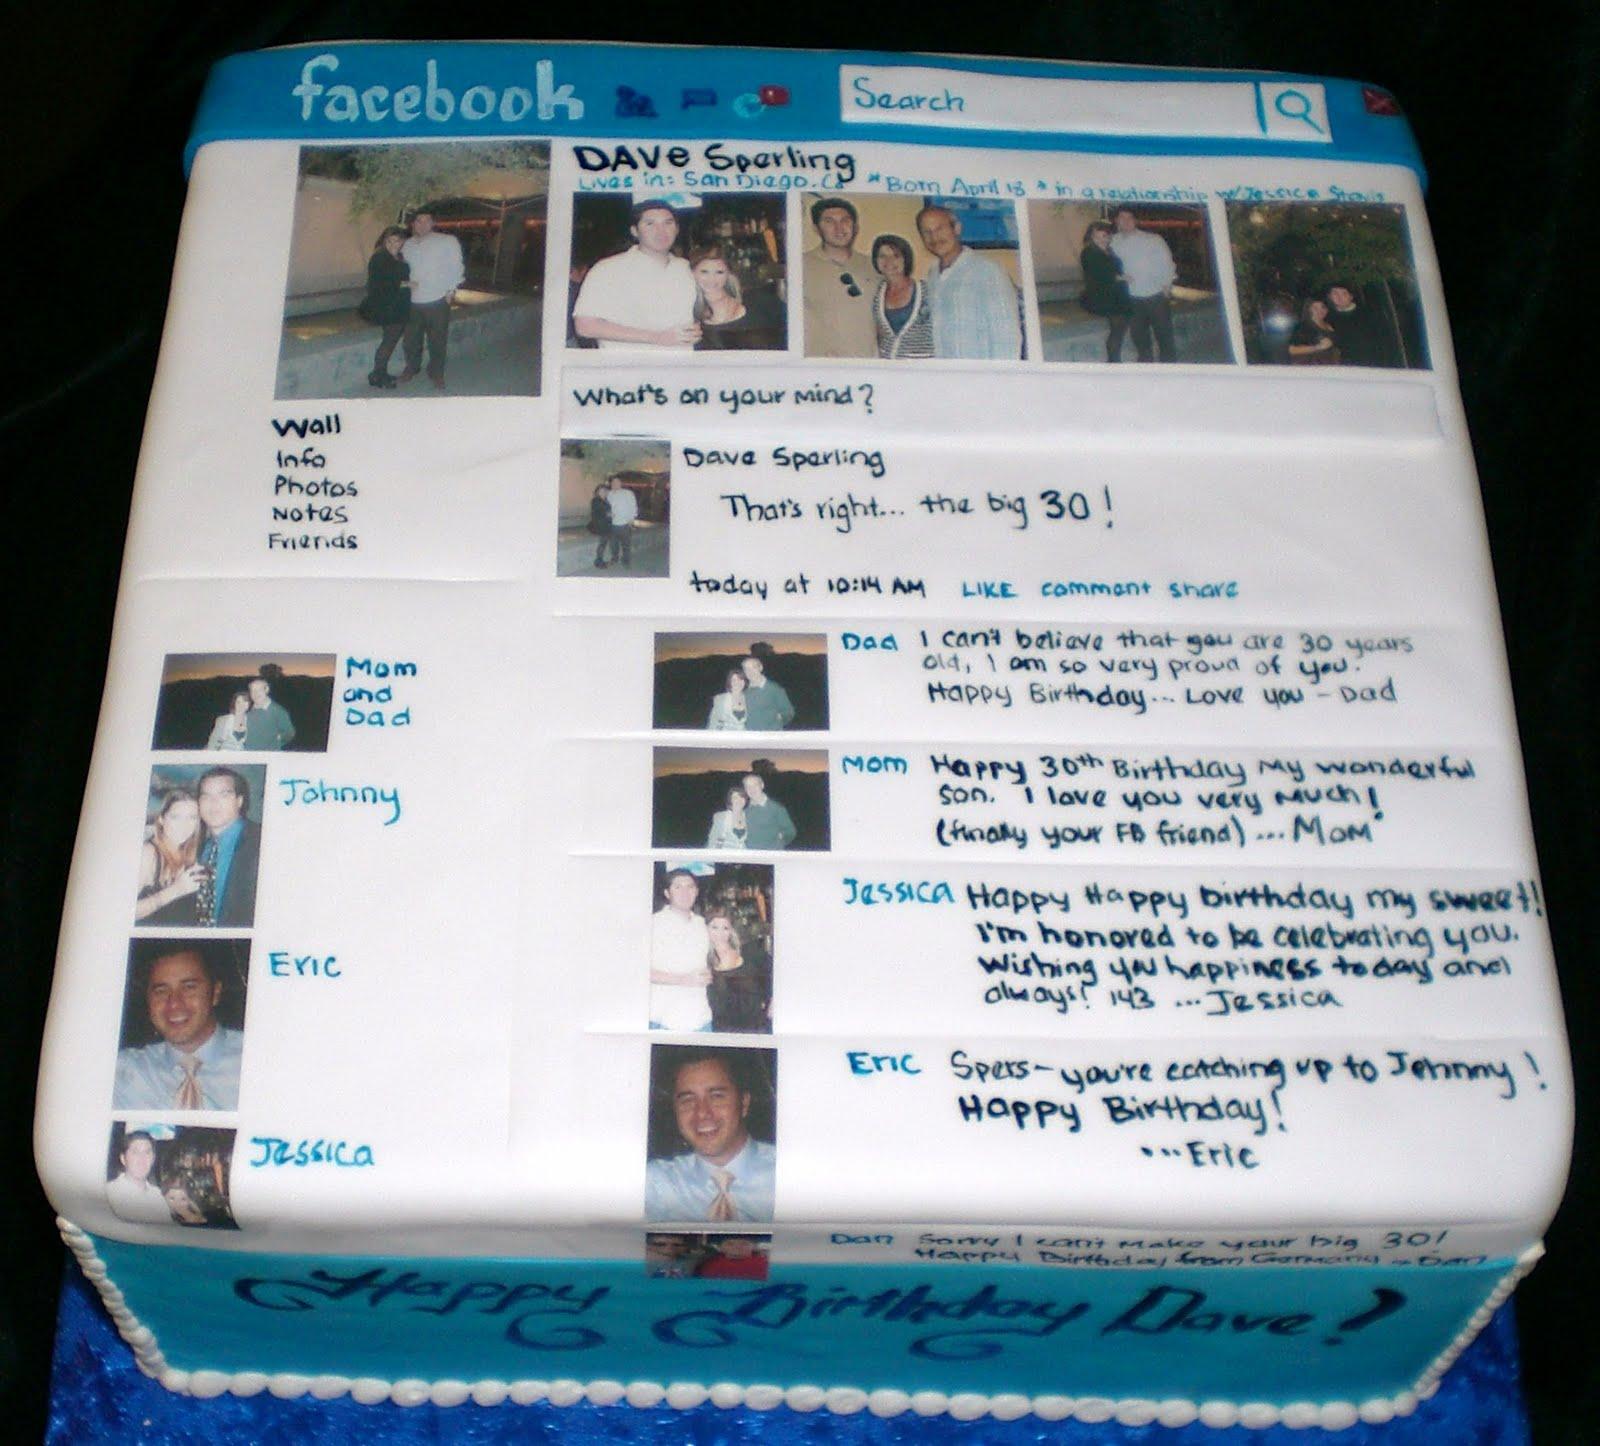 Birthday Cakes On Facebook